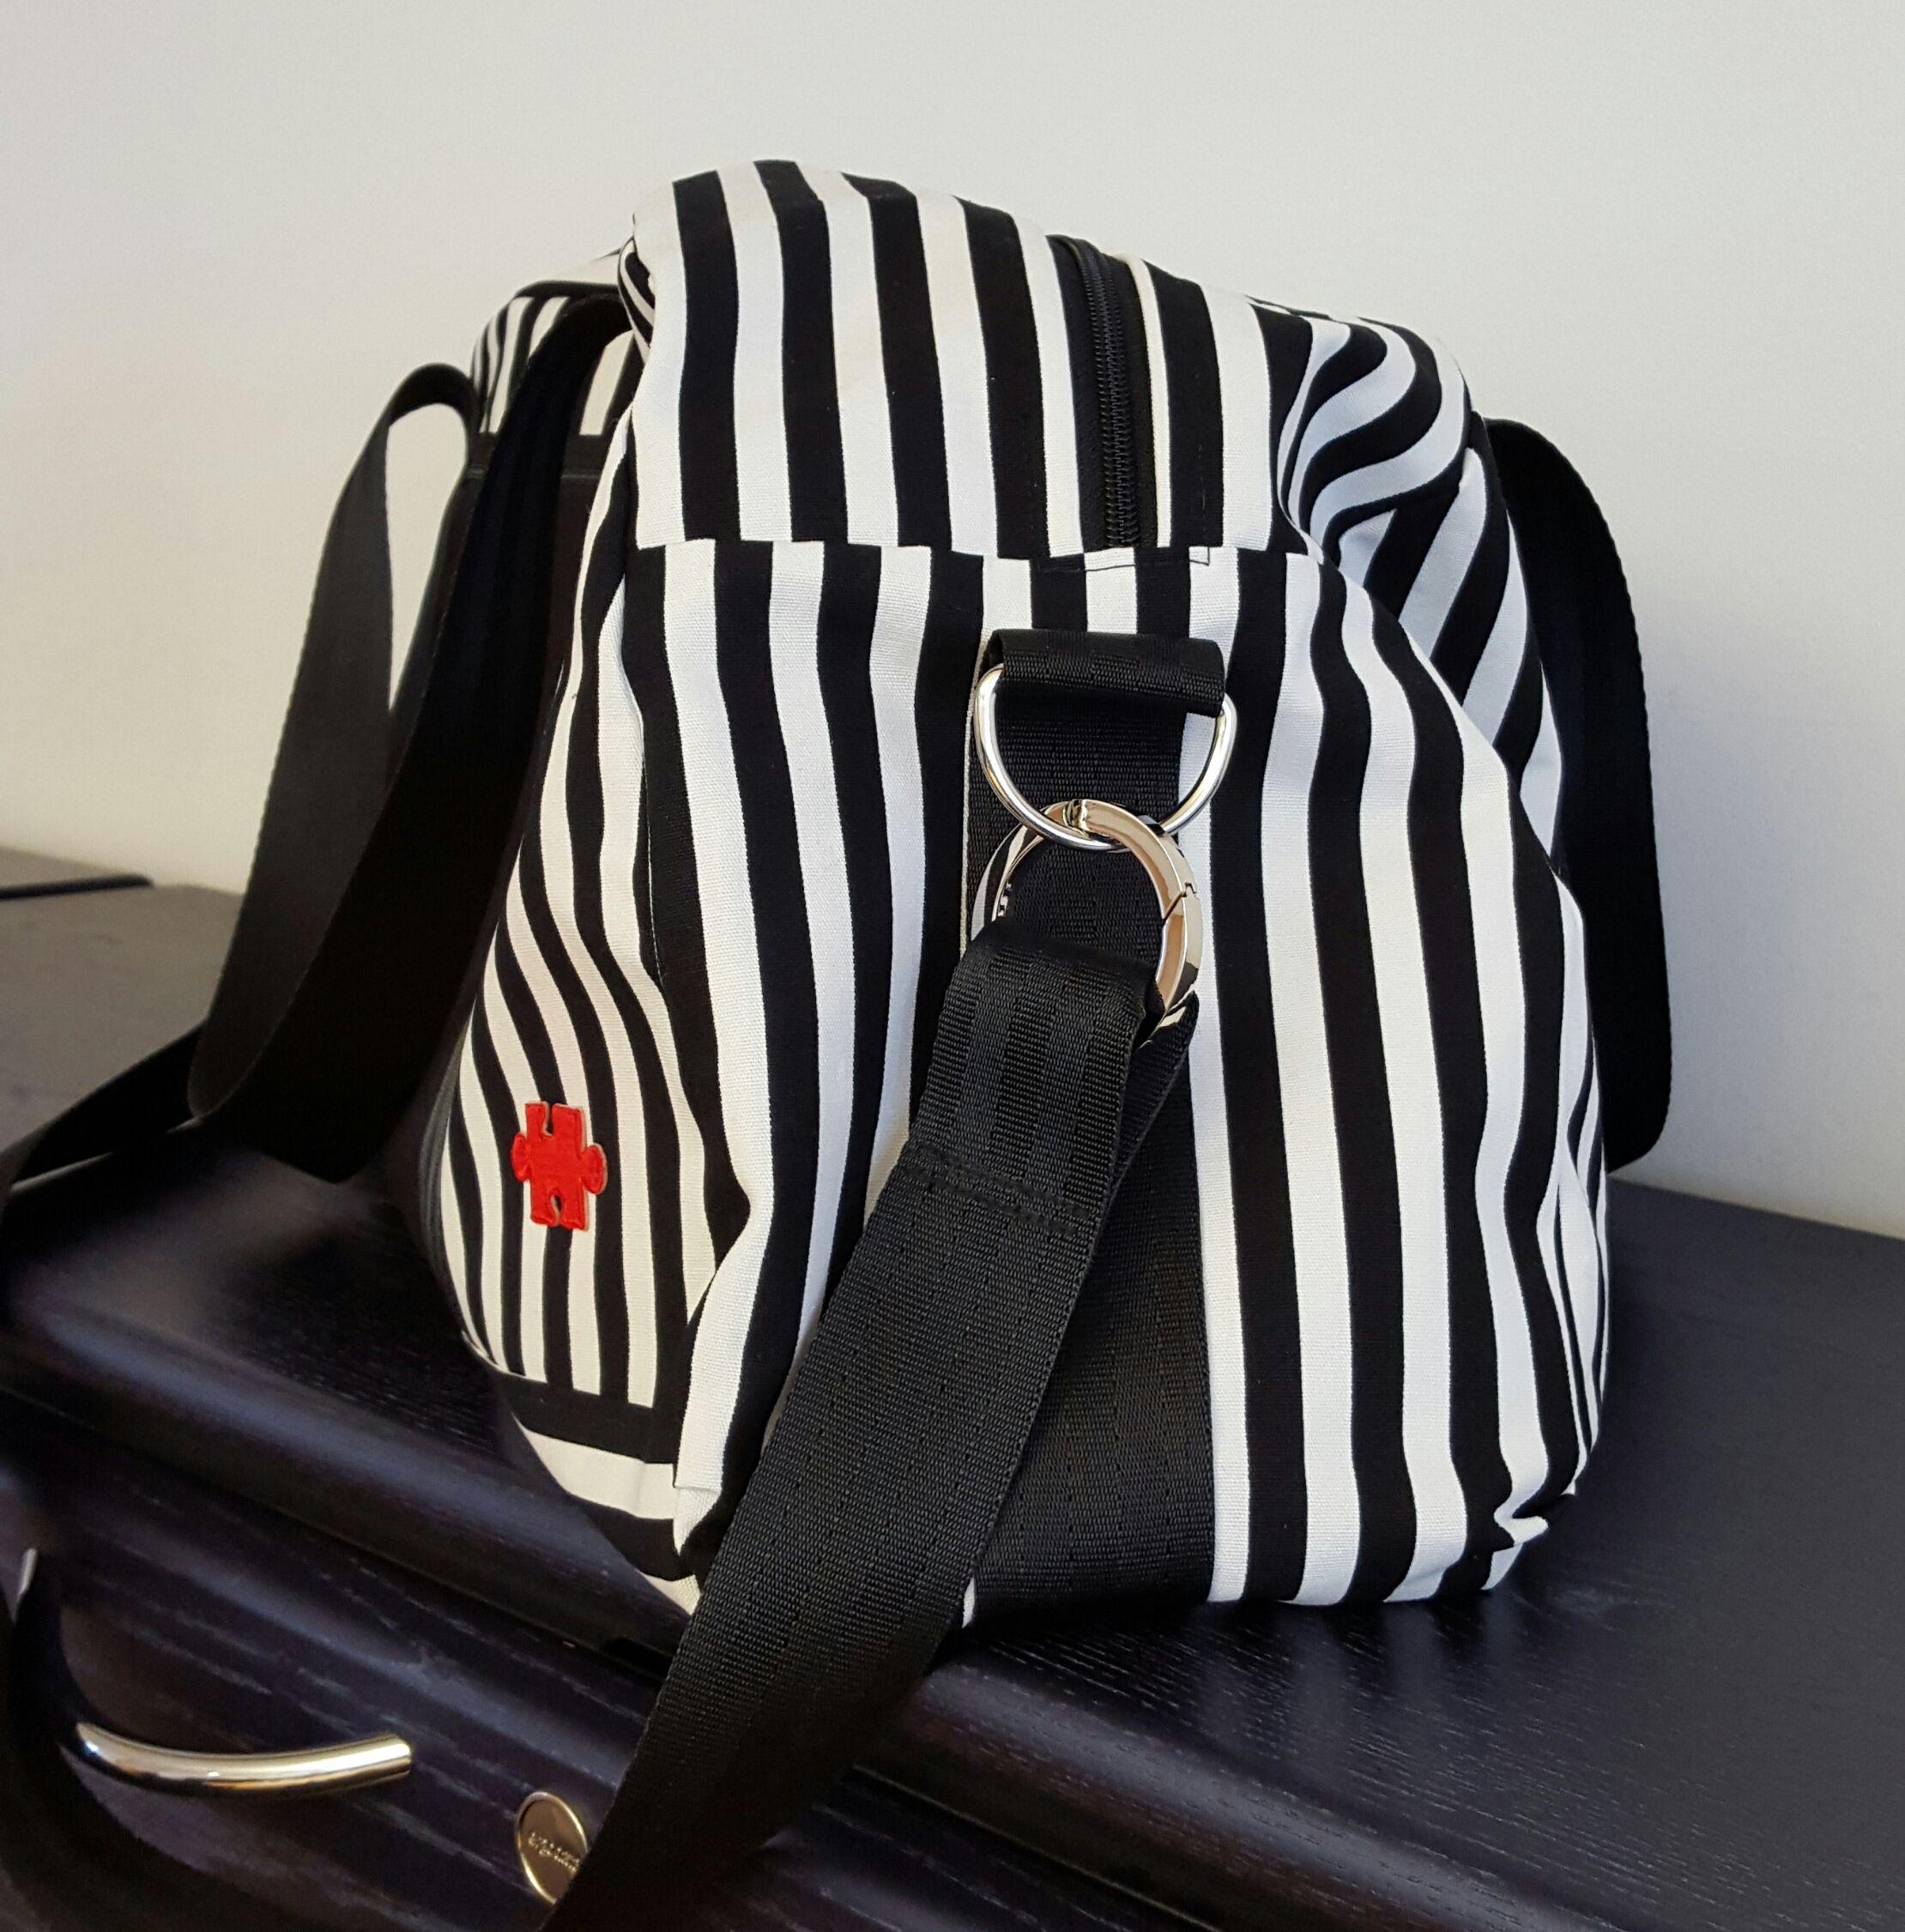 Reisetasche König